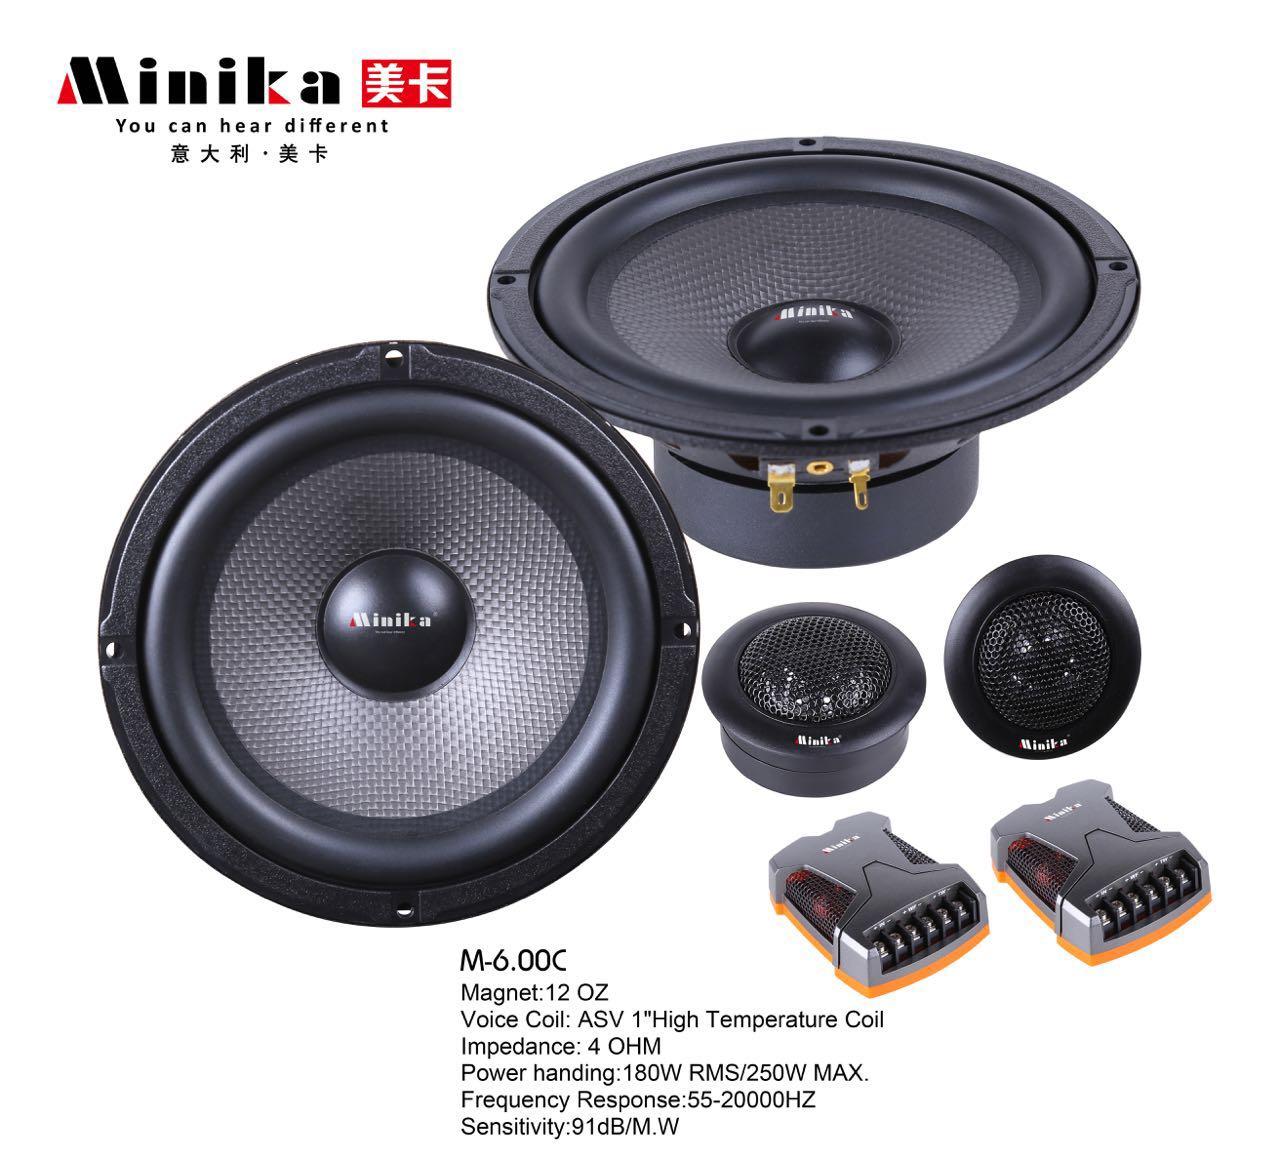 altavoces de audio est/éreo para altavoces de alta potencia de altavoces de super potencia de tweeter de autom/óviles Altavoces de audio para autos